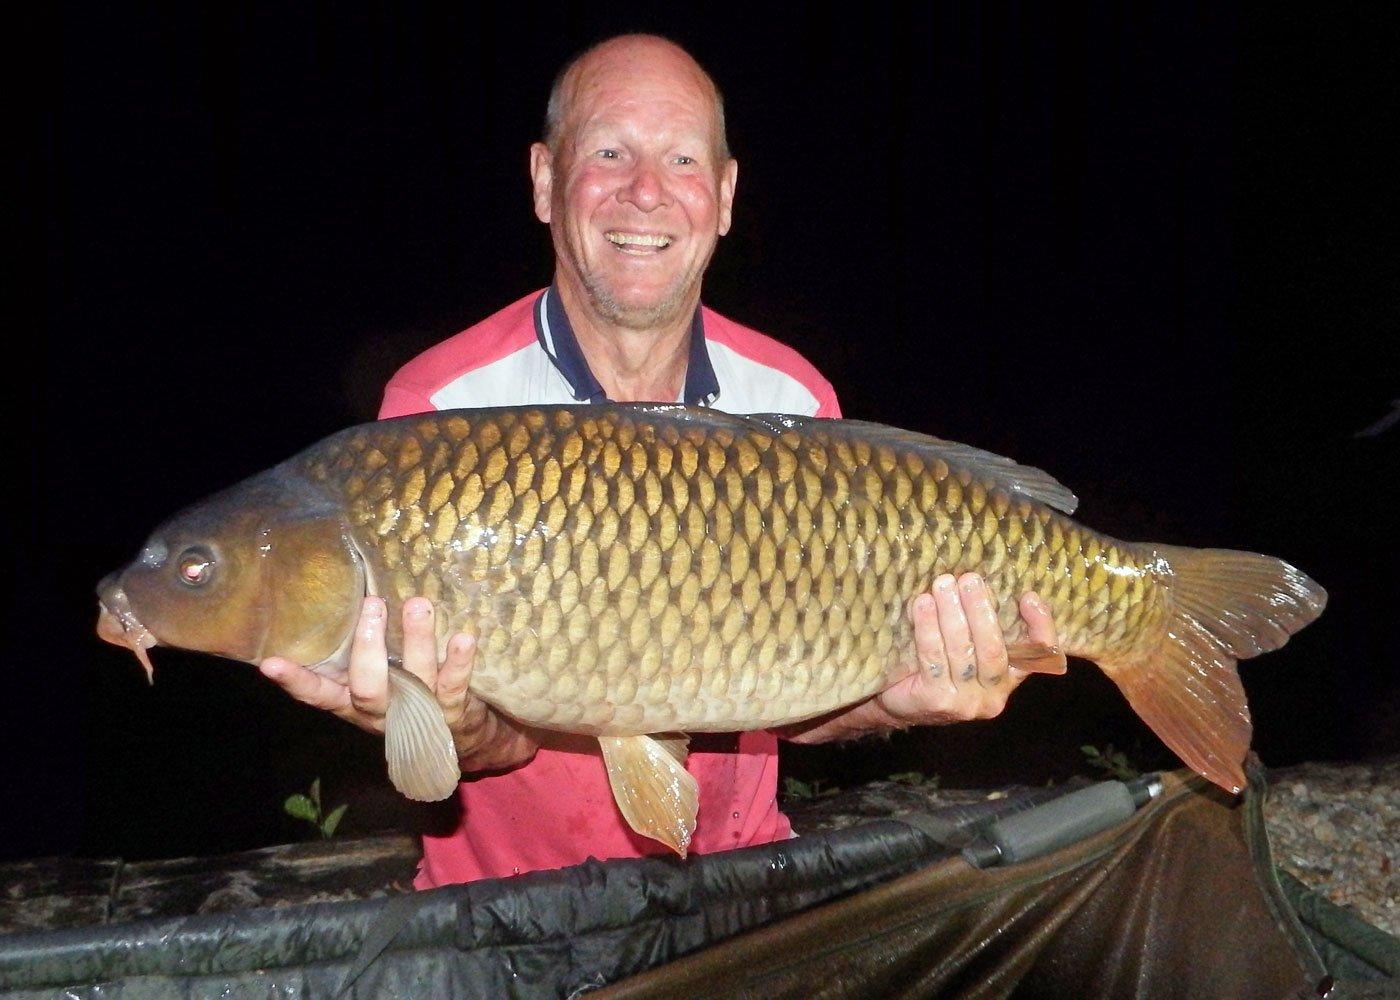 Ian with a 30lbs 6oz common carp